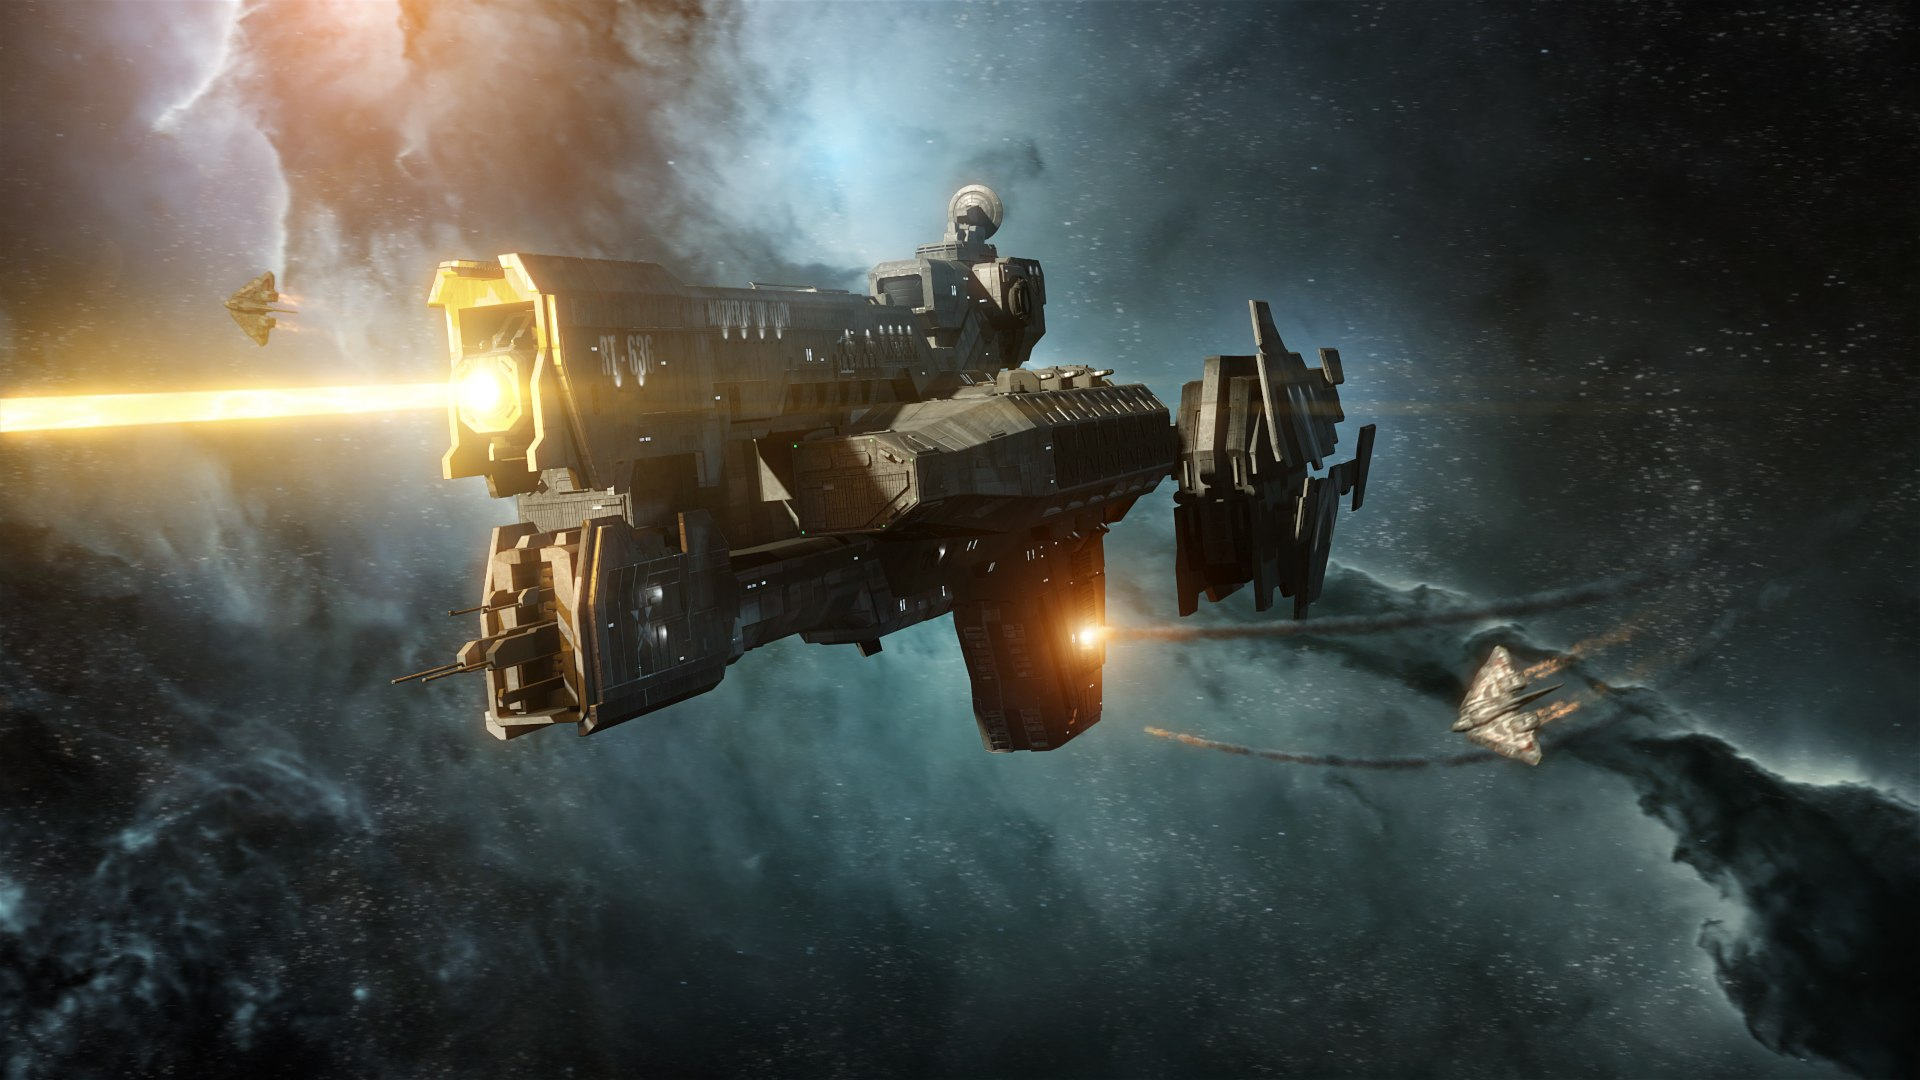 High Resolution Amazing Sci Fi Space Battle Wallpaper HD 9 1920x1080